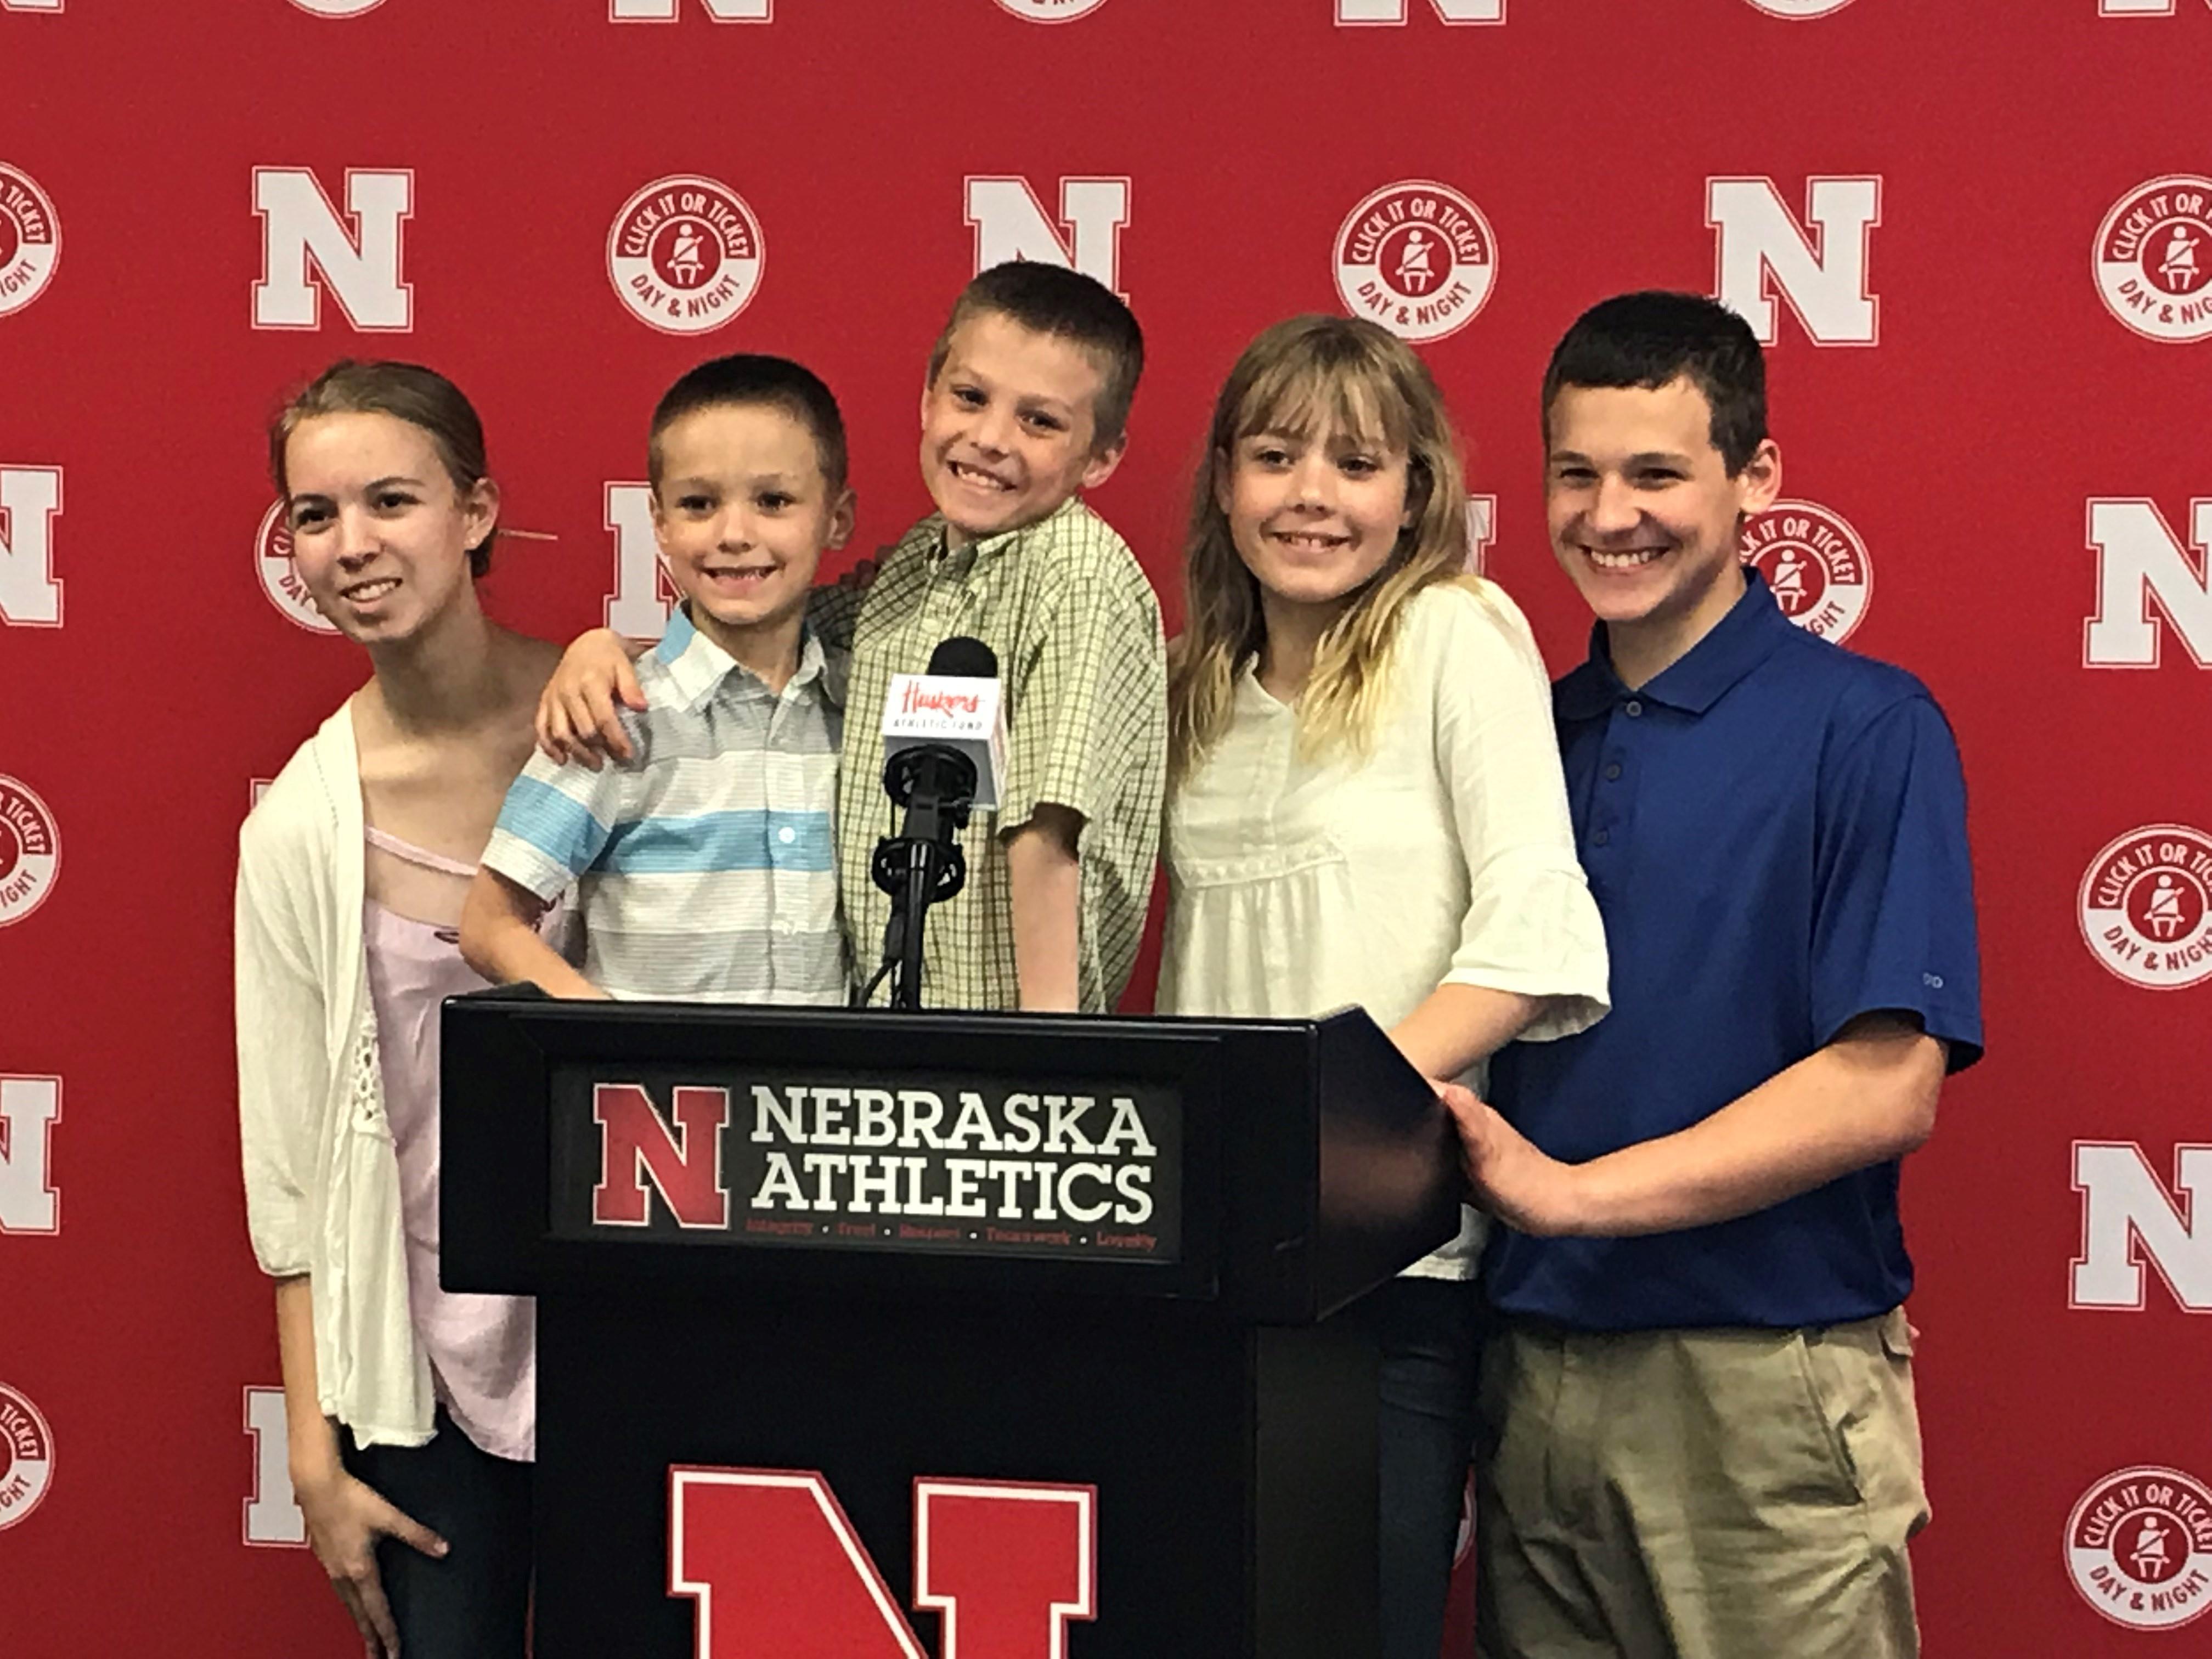 Family Press Photo